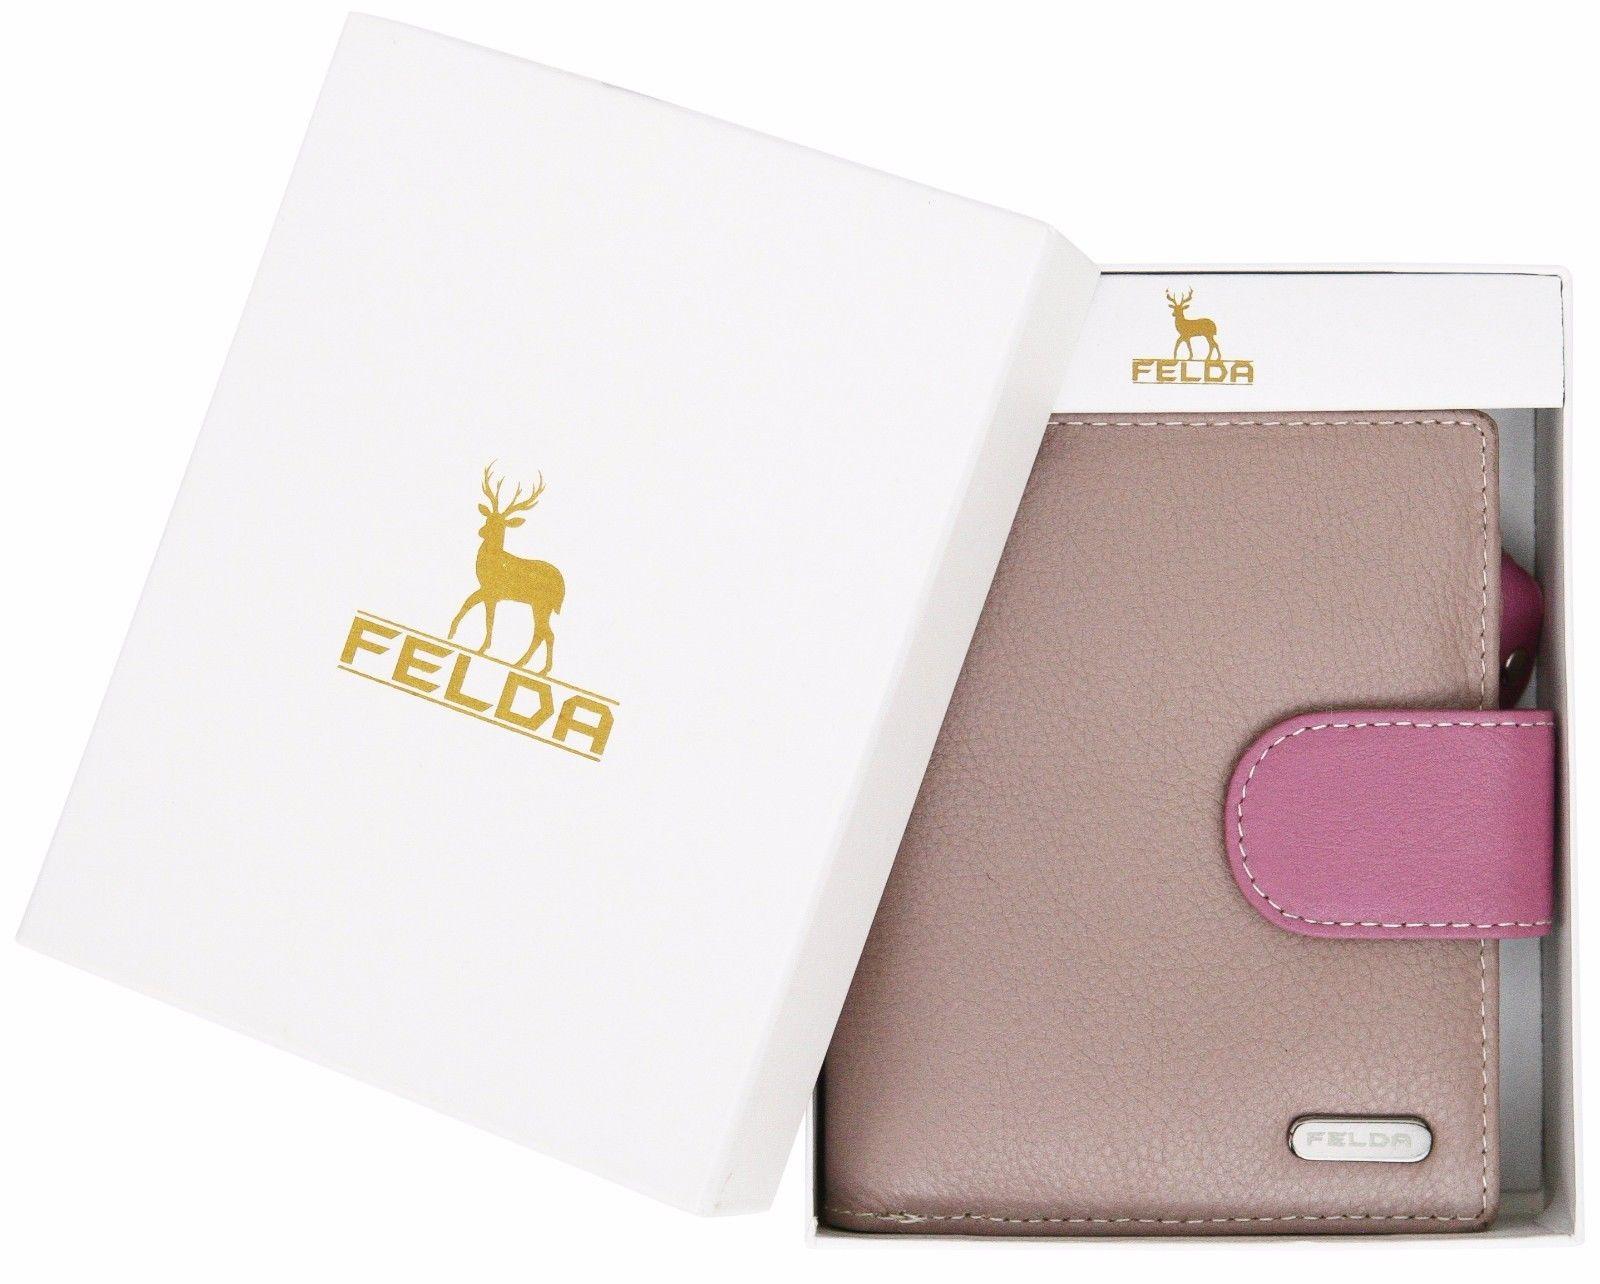 Felda-RFID-onorevoli-MEDAGLIA-amp-Card-Purse-Wallet-Genuine-Leather-Multi-SOFT-BOX-REGALO miniatura 81